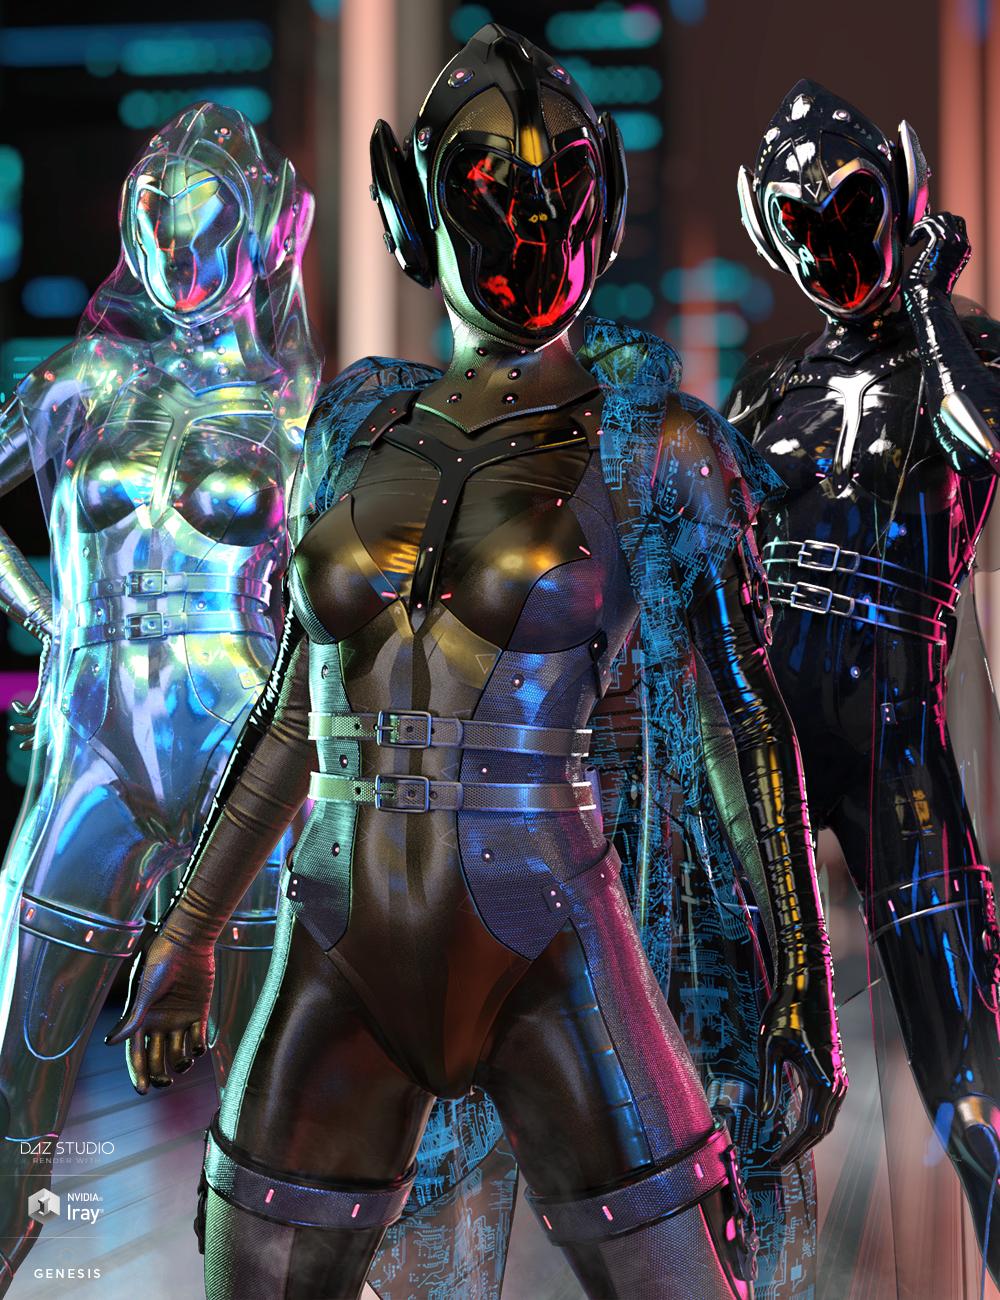 dForce Void Suit-X Outfit Iray Texture Set by: HM, 3D Models by Daz 3D